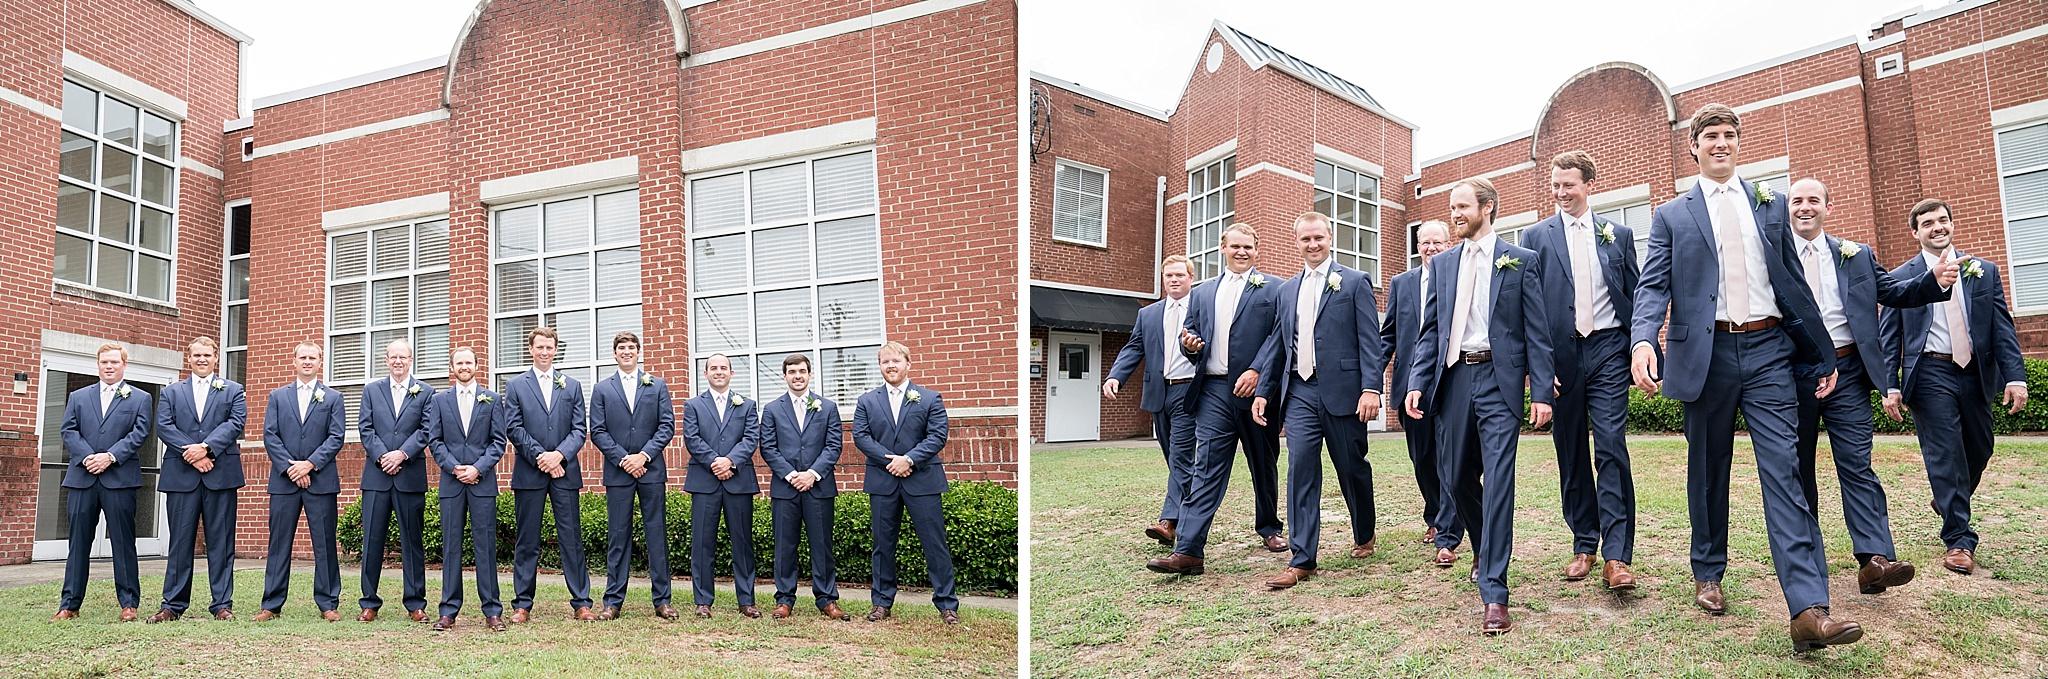 Williamston-NC-Wedding-Photographer-014.jpg